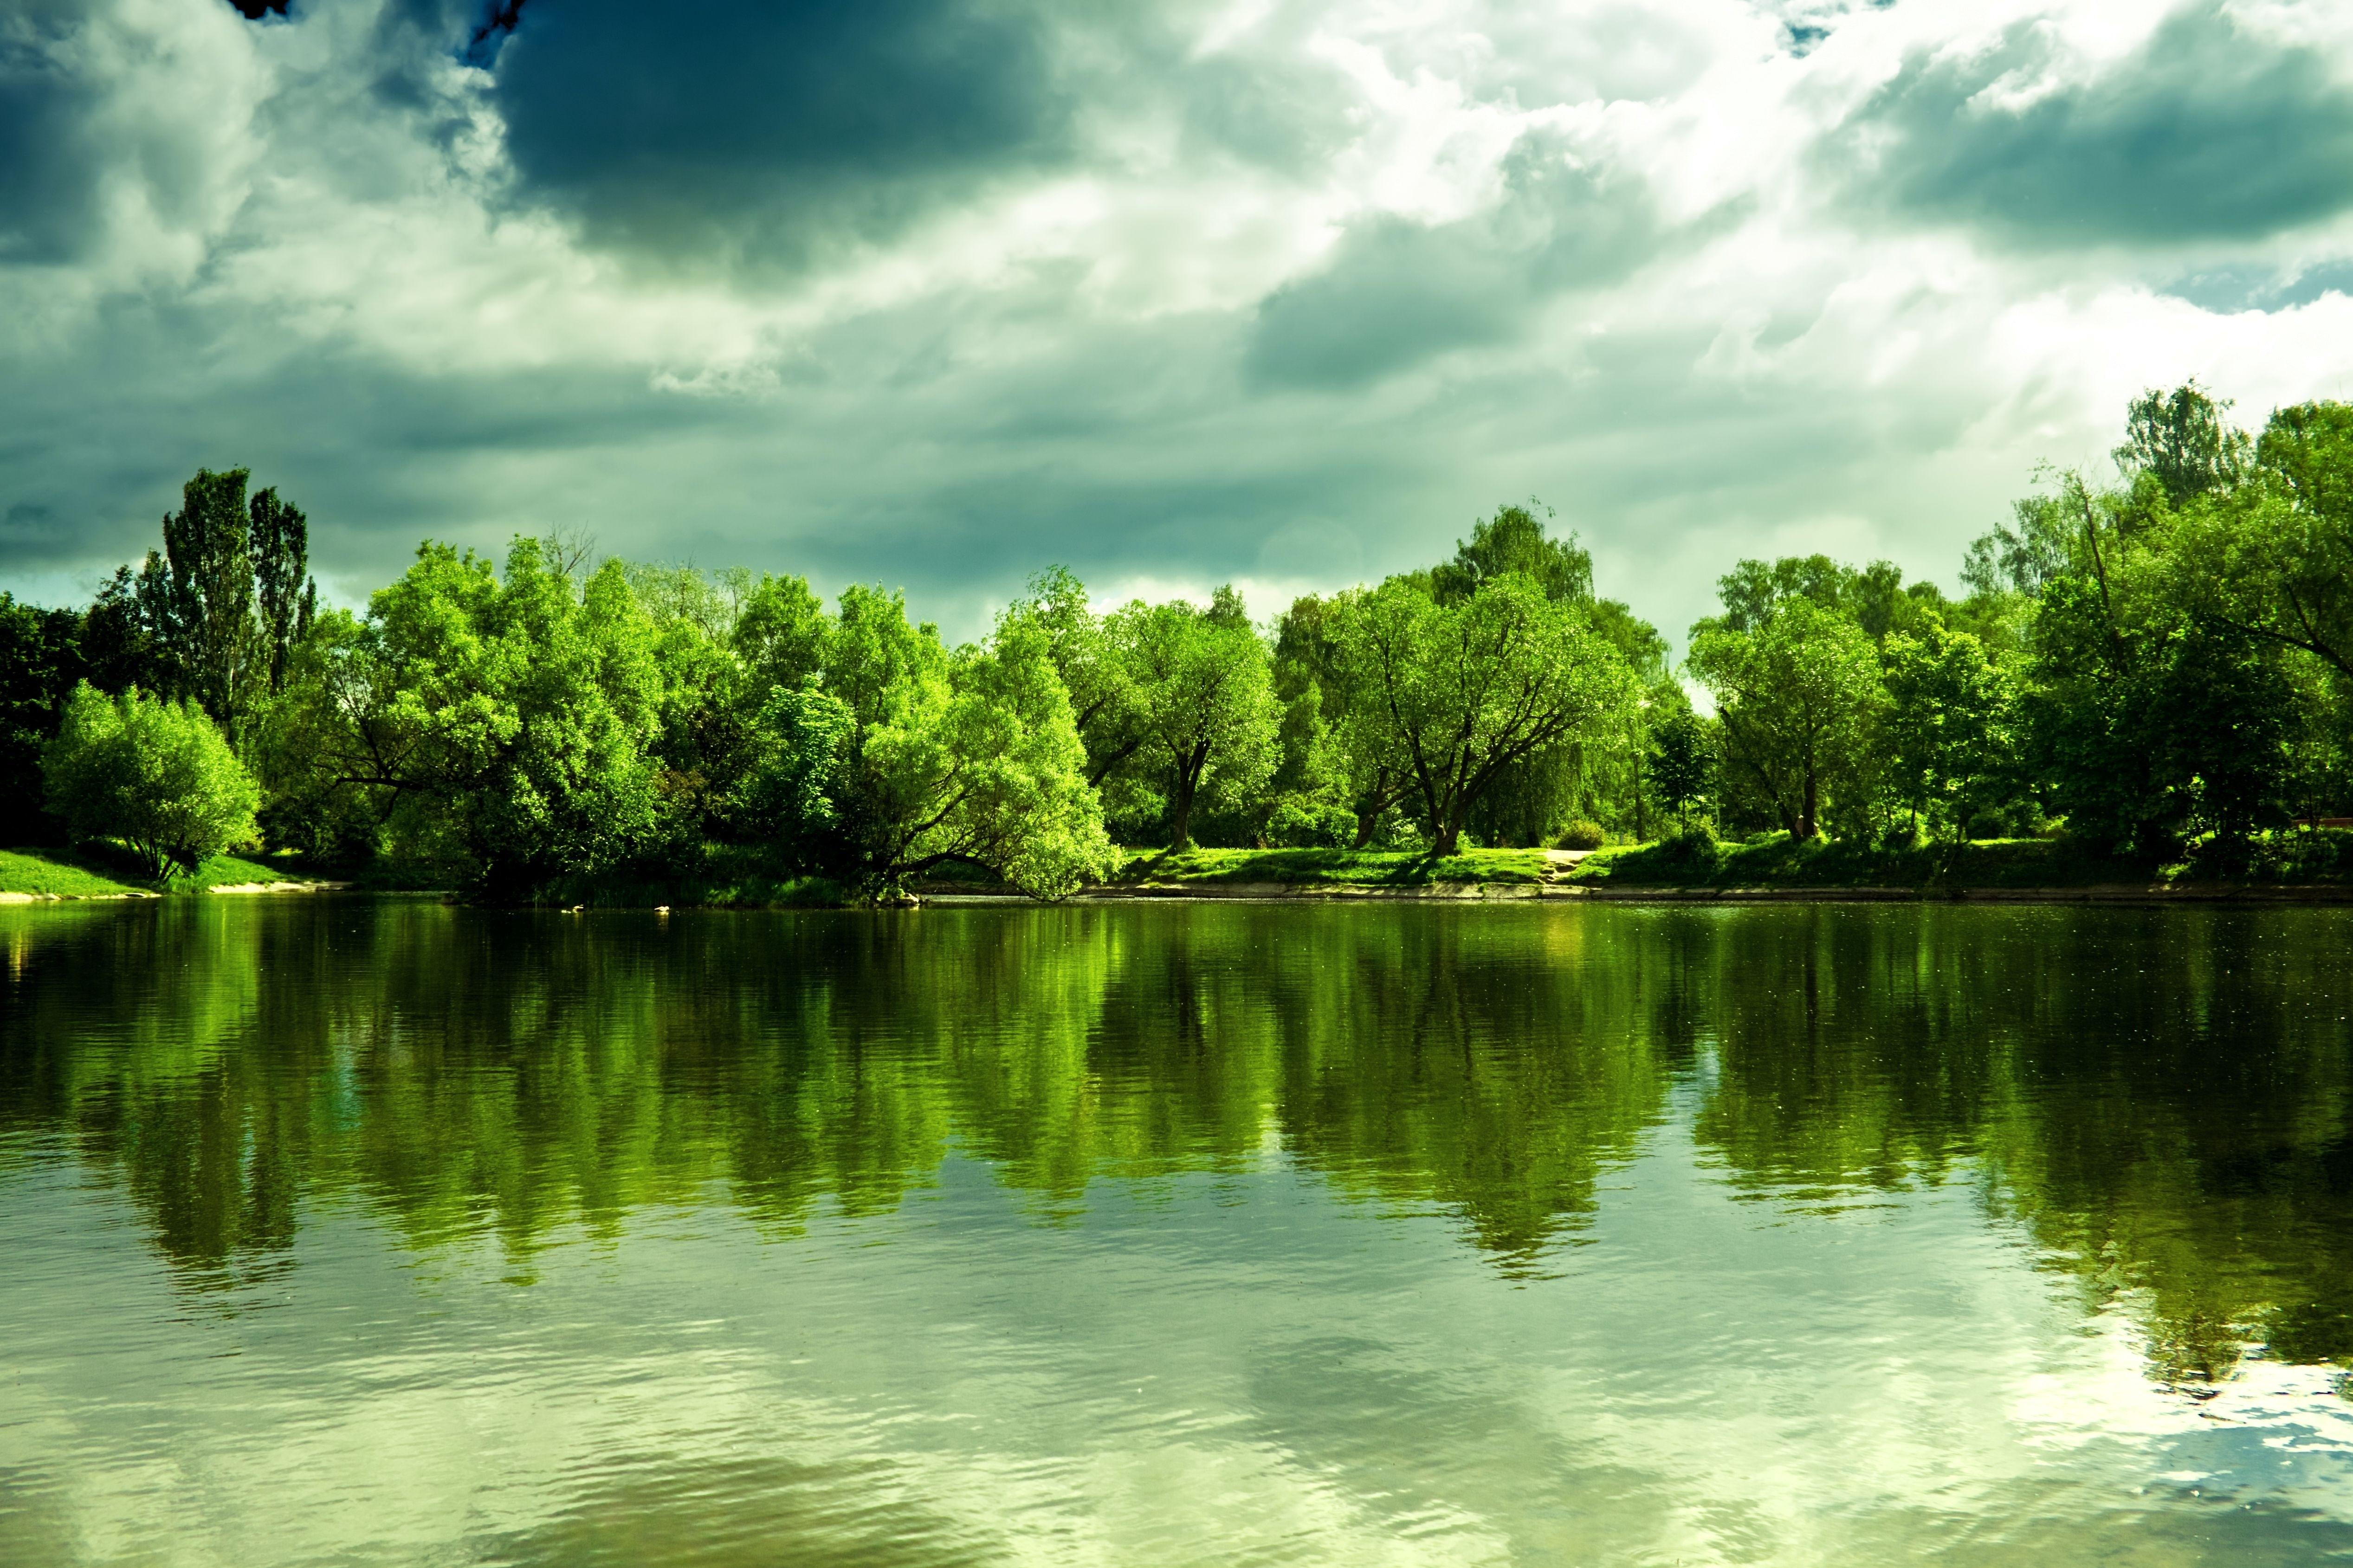 Green landscape of the lake HD Desktop Wallpaper HD Desktop 5070x3379